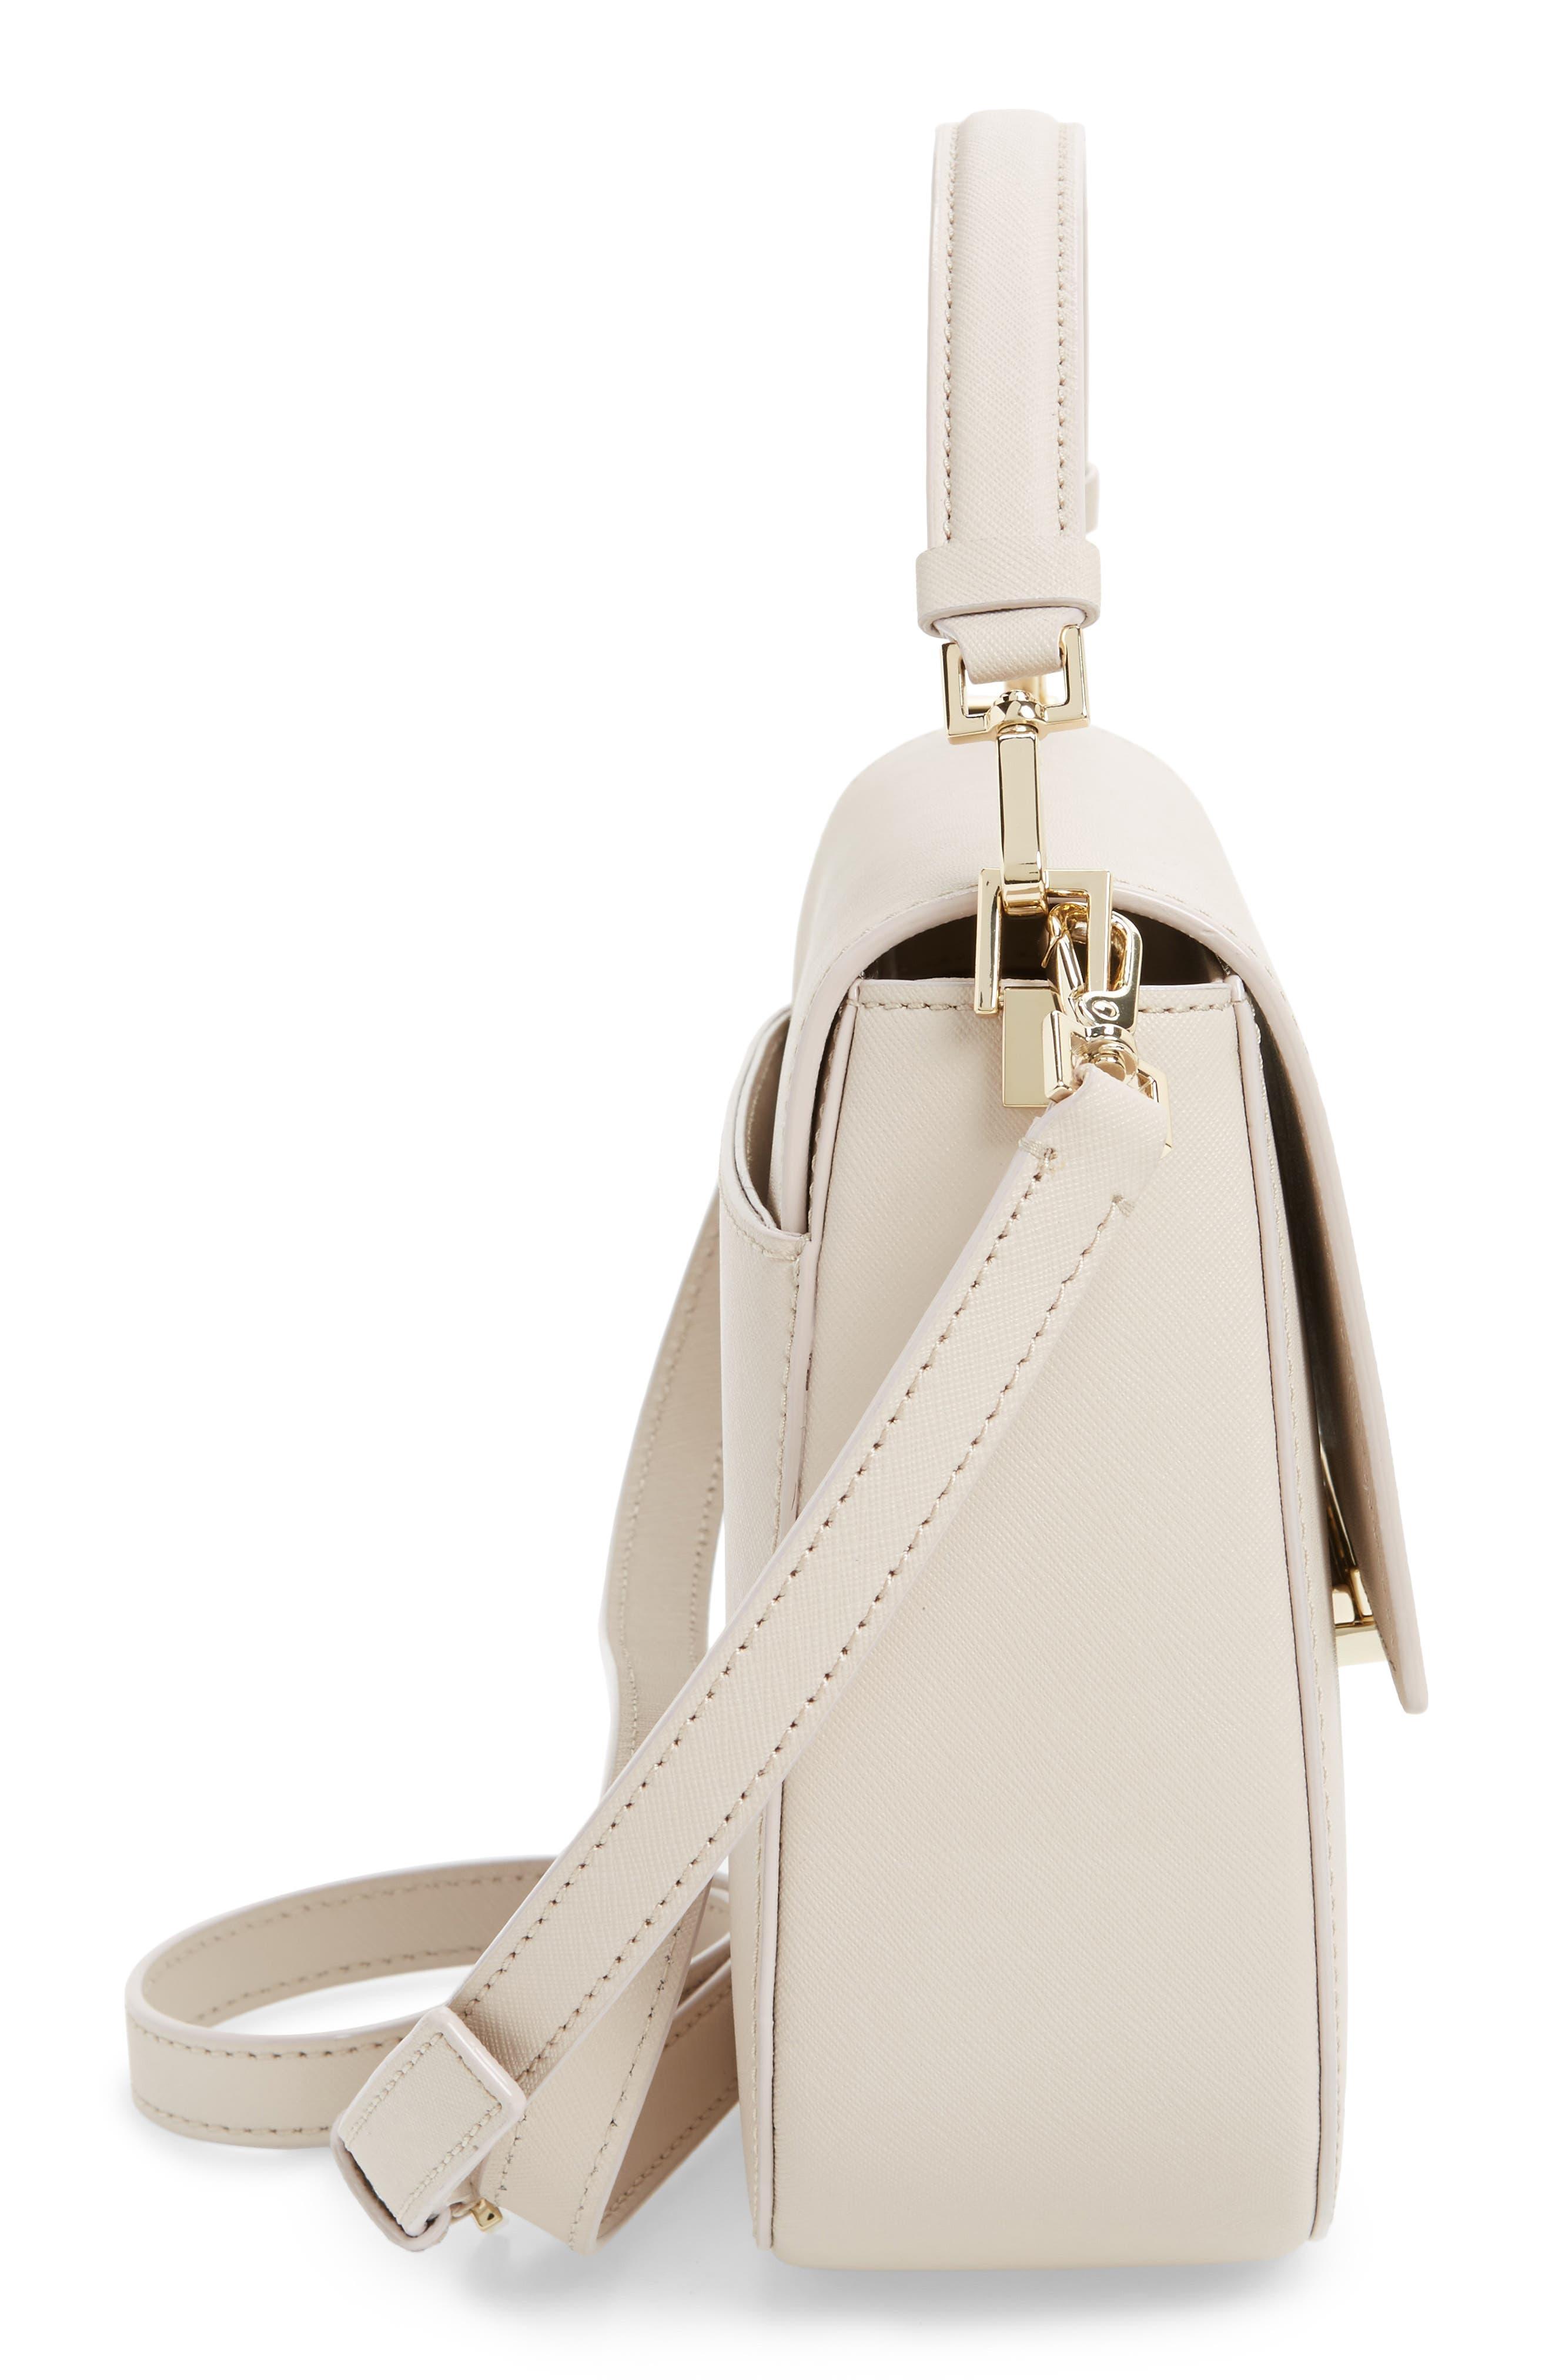 make it mine - byrdie leather saddle bag,                             Alternate thumbnail 10, color,